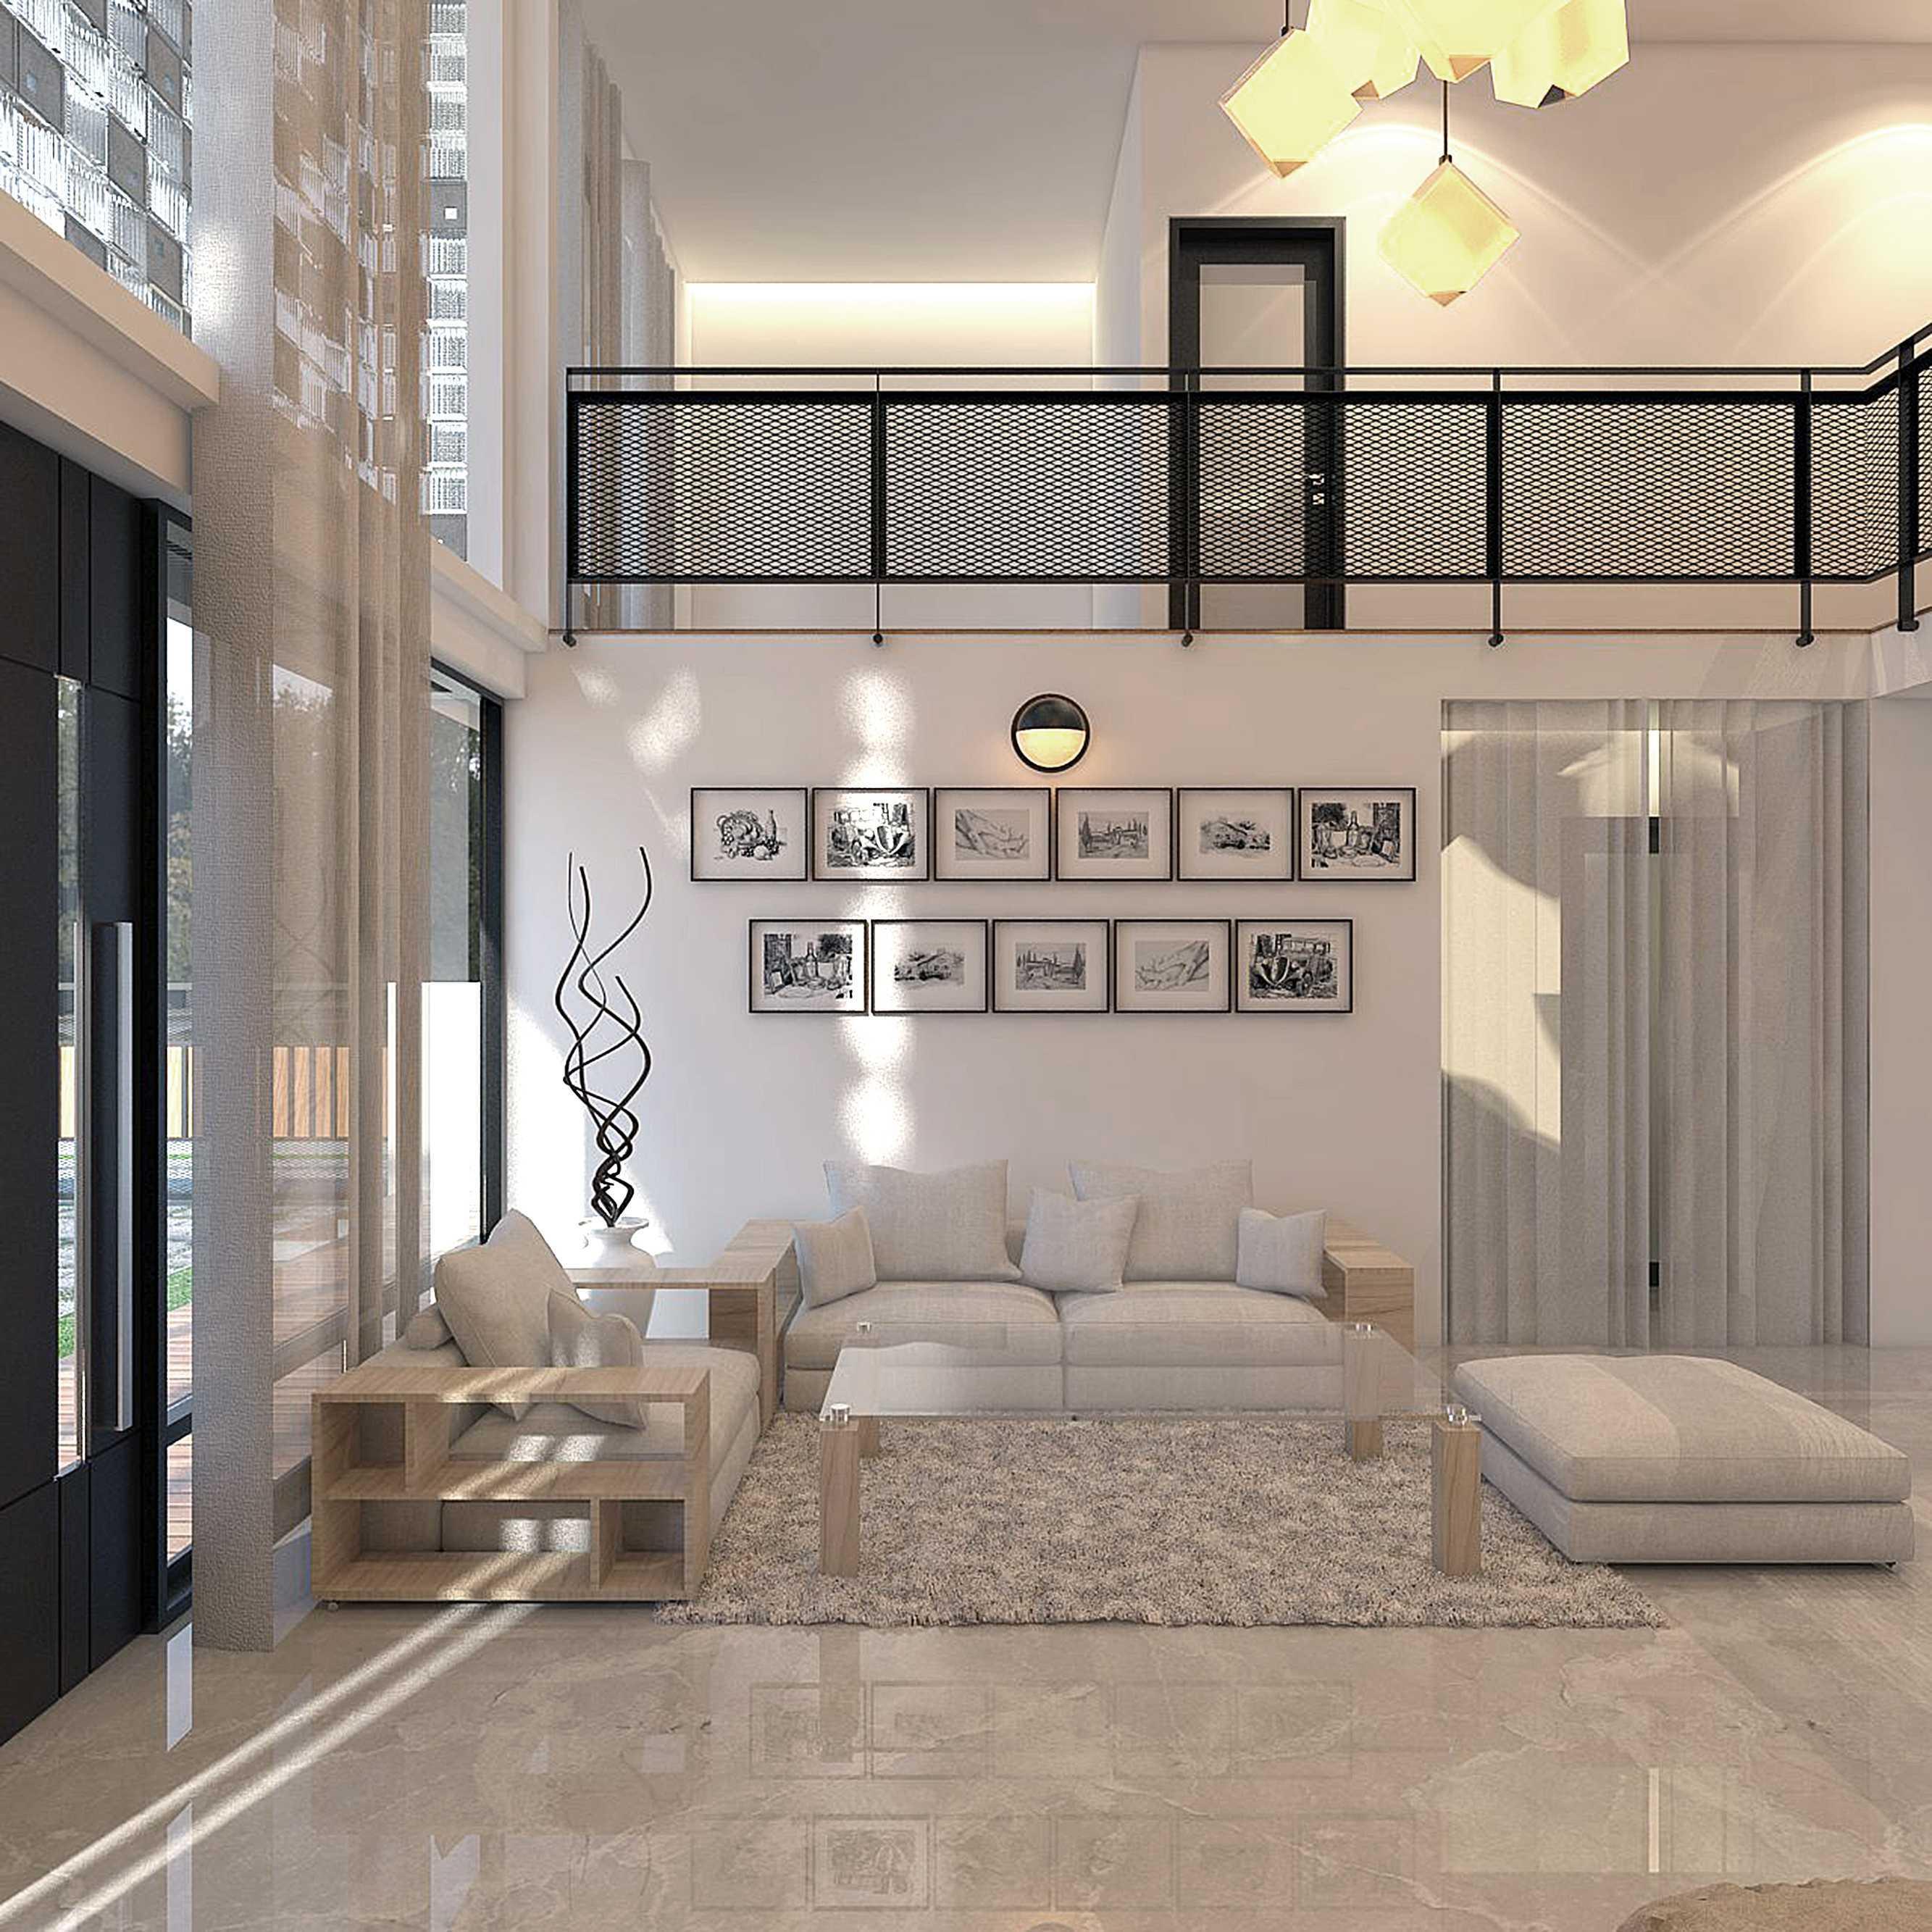 Studio Nol 'ua' House Medan Johor, Kota Medan, Sumatera Utara, Indonesia Medan Johor, Kota Medan, Sumatera Utara, Indonesia Living Room   47820